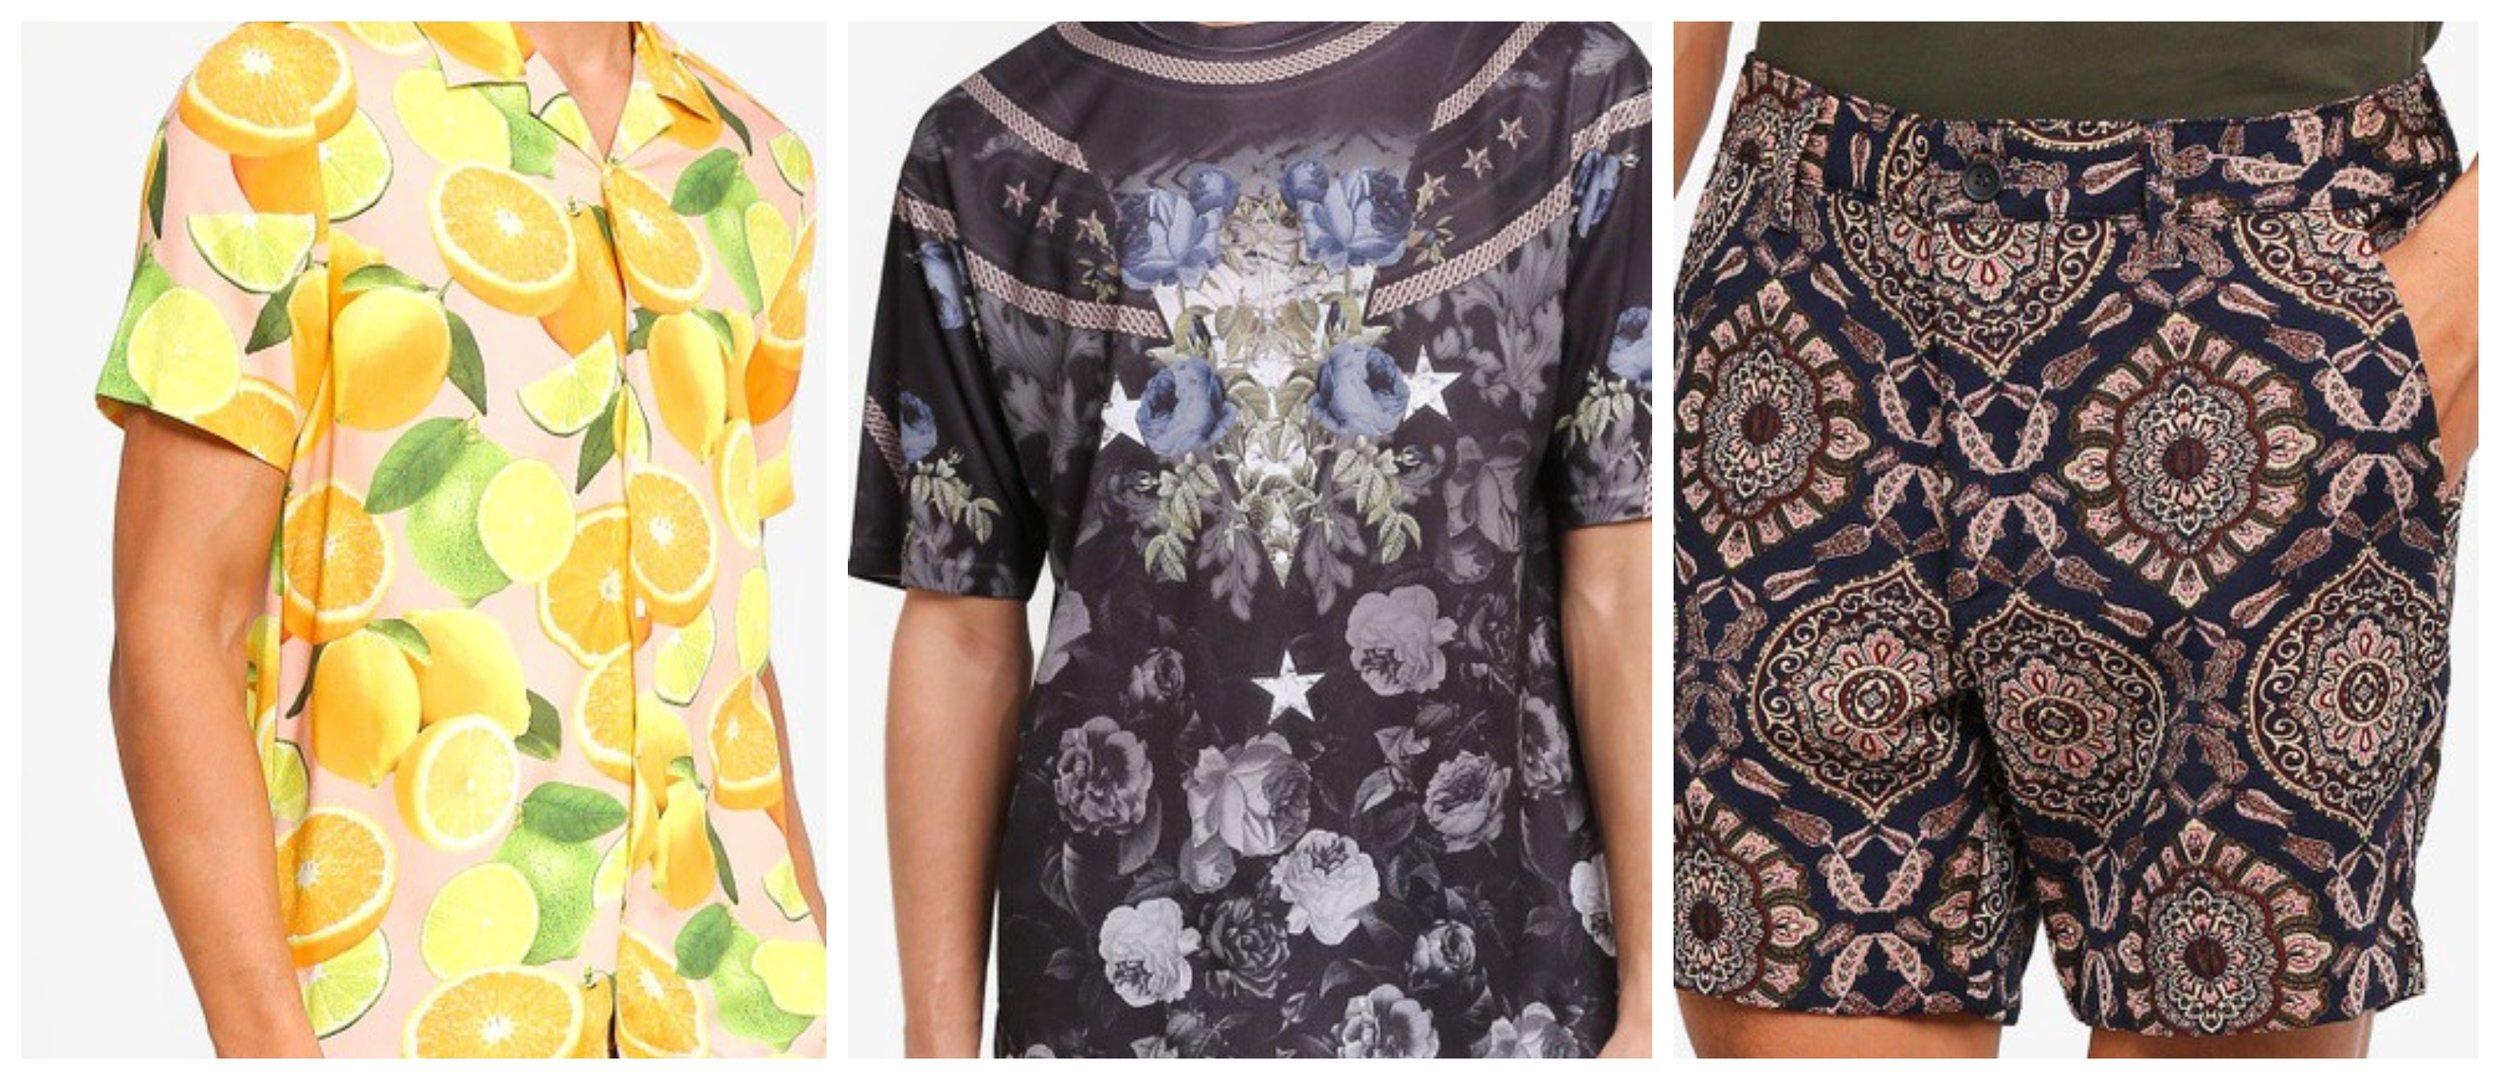 Pink Lemon Short Sleeve Shirt    Navy Floral Mesh T-Shirt     Tapestry Chino Shorts